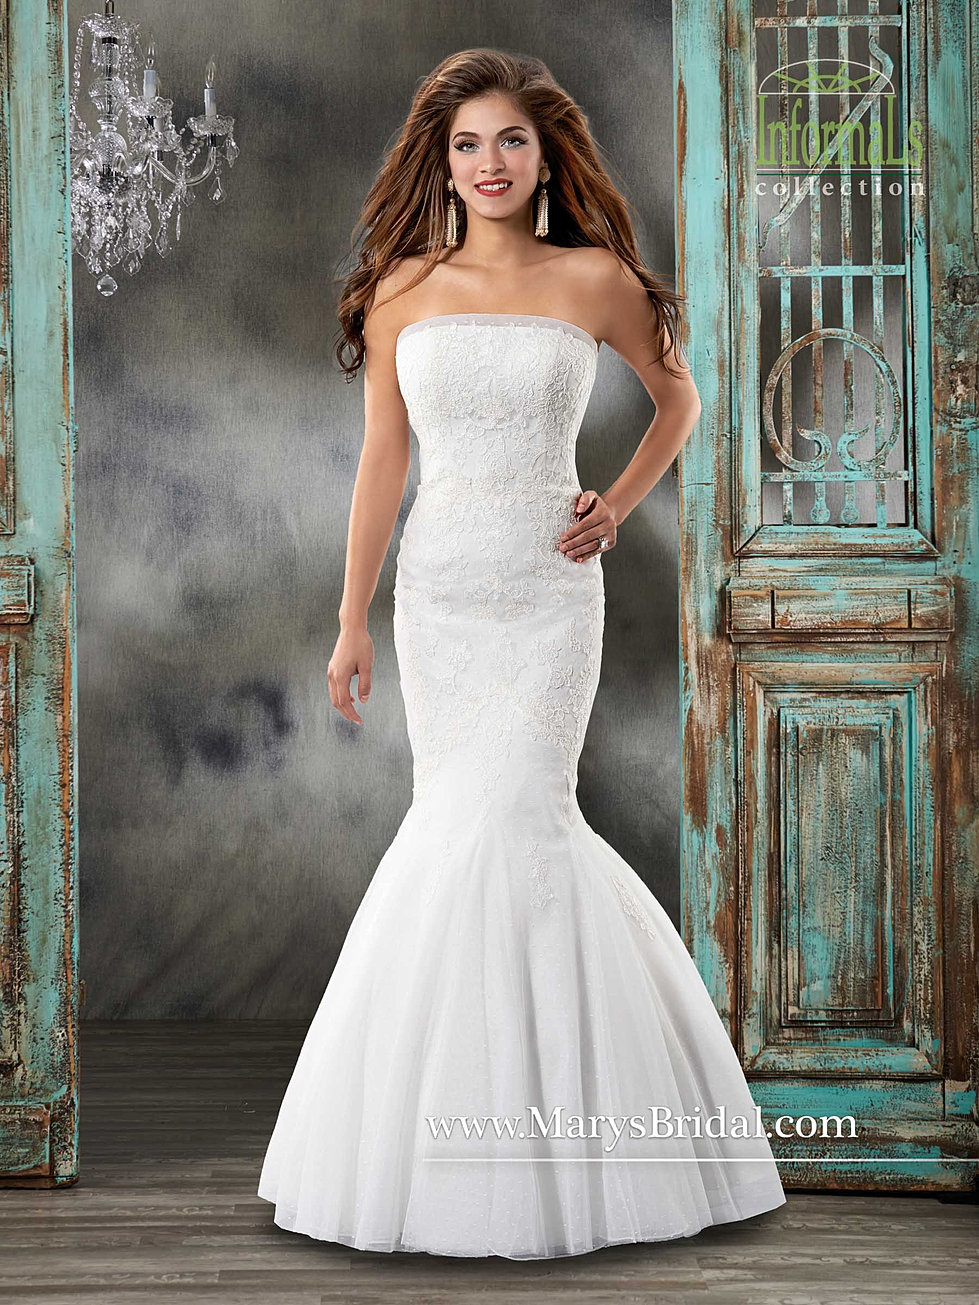 Elyse&-39-s Boutique Bridal &amp- Prom